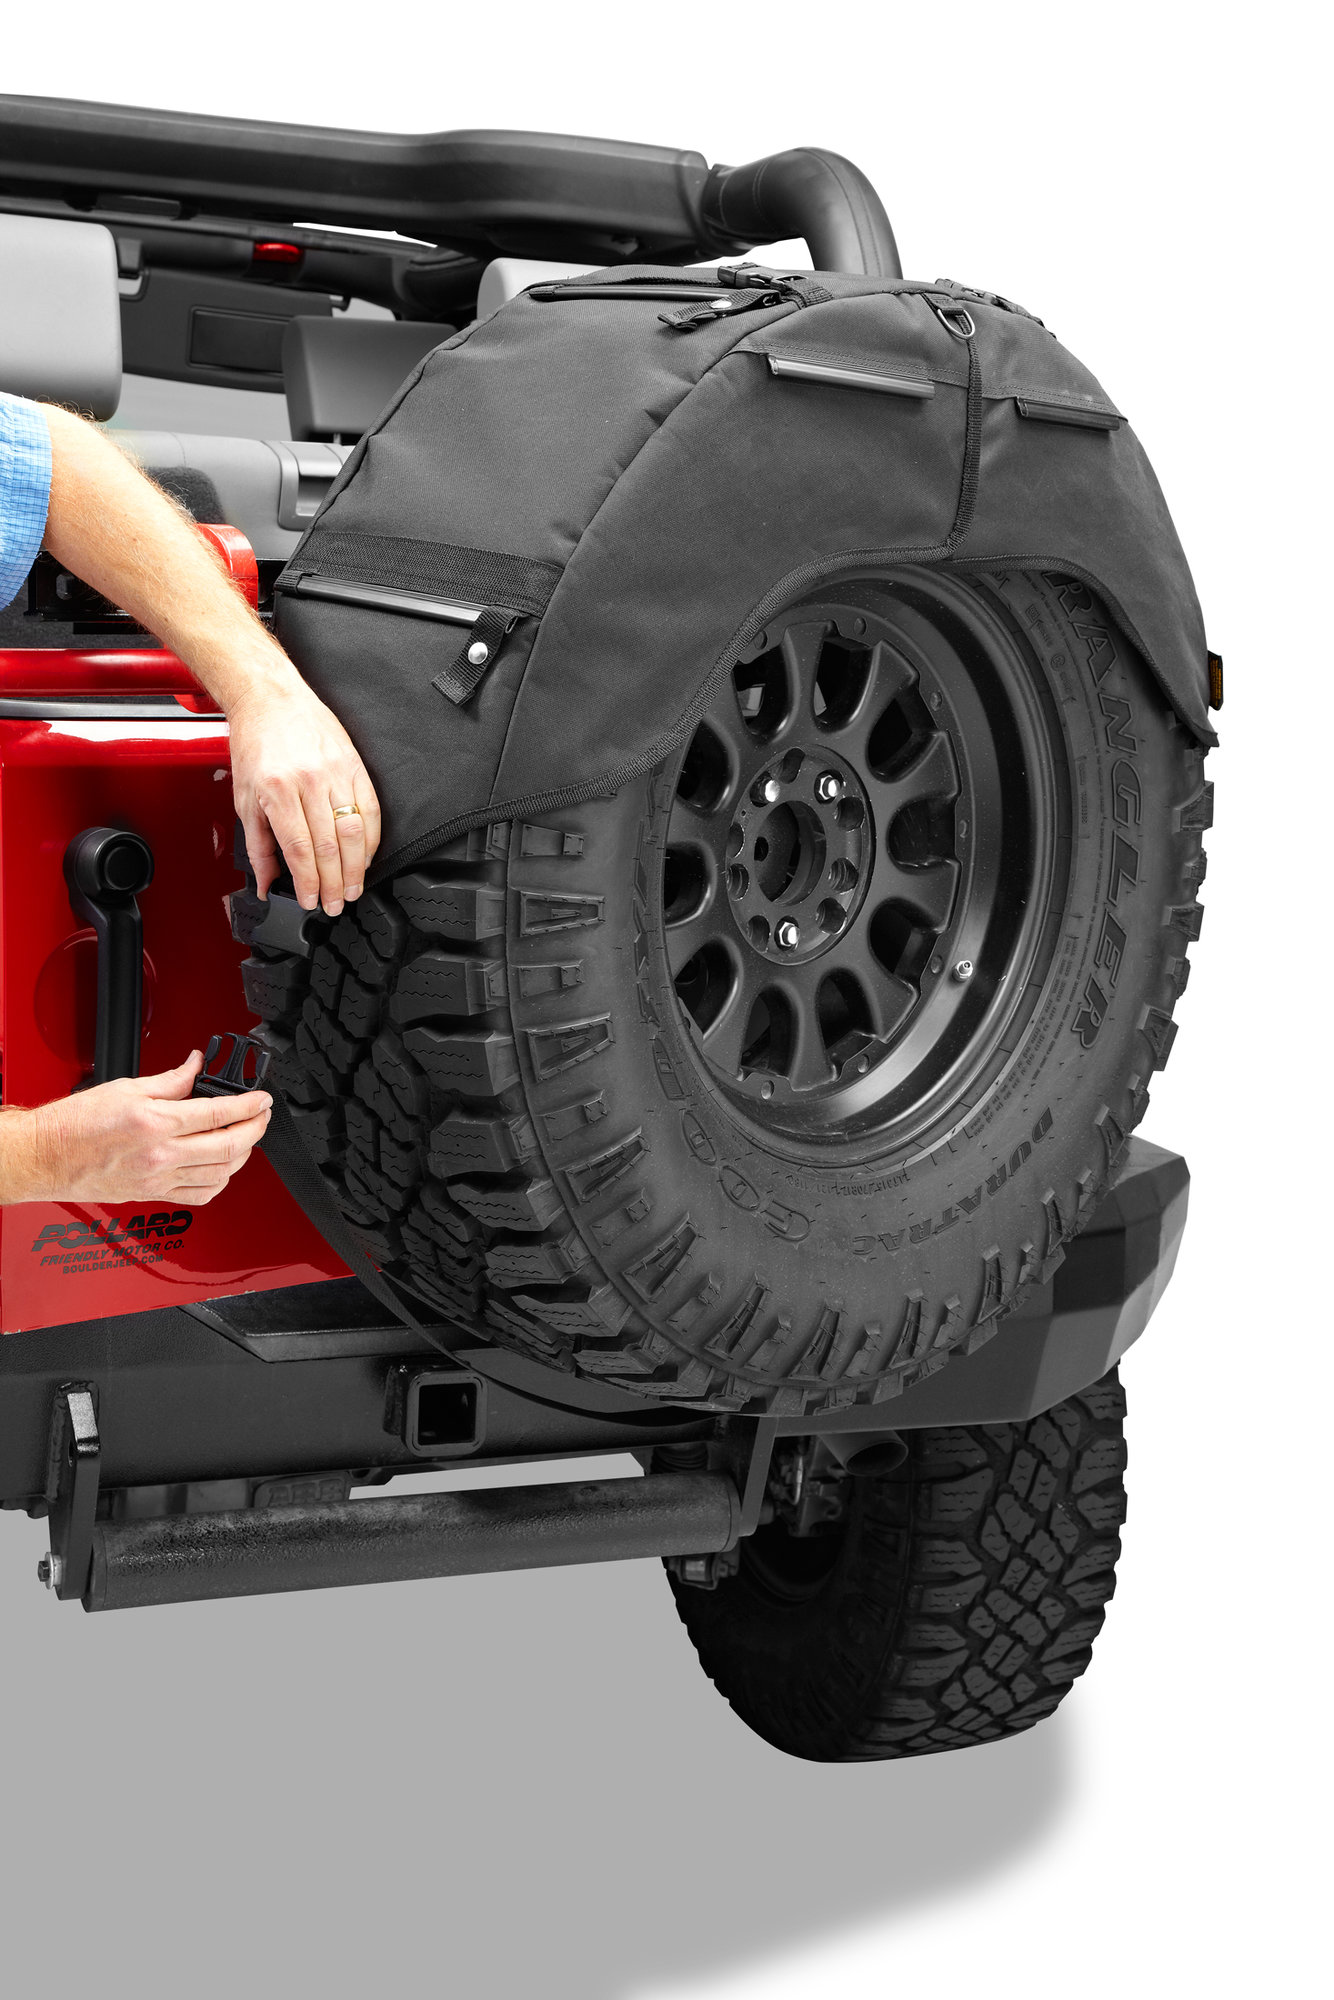 Jeep Patriot Interior Accessories